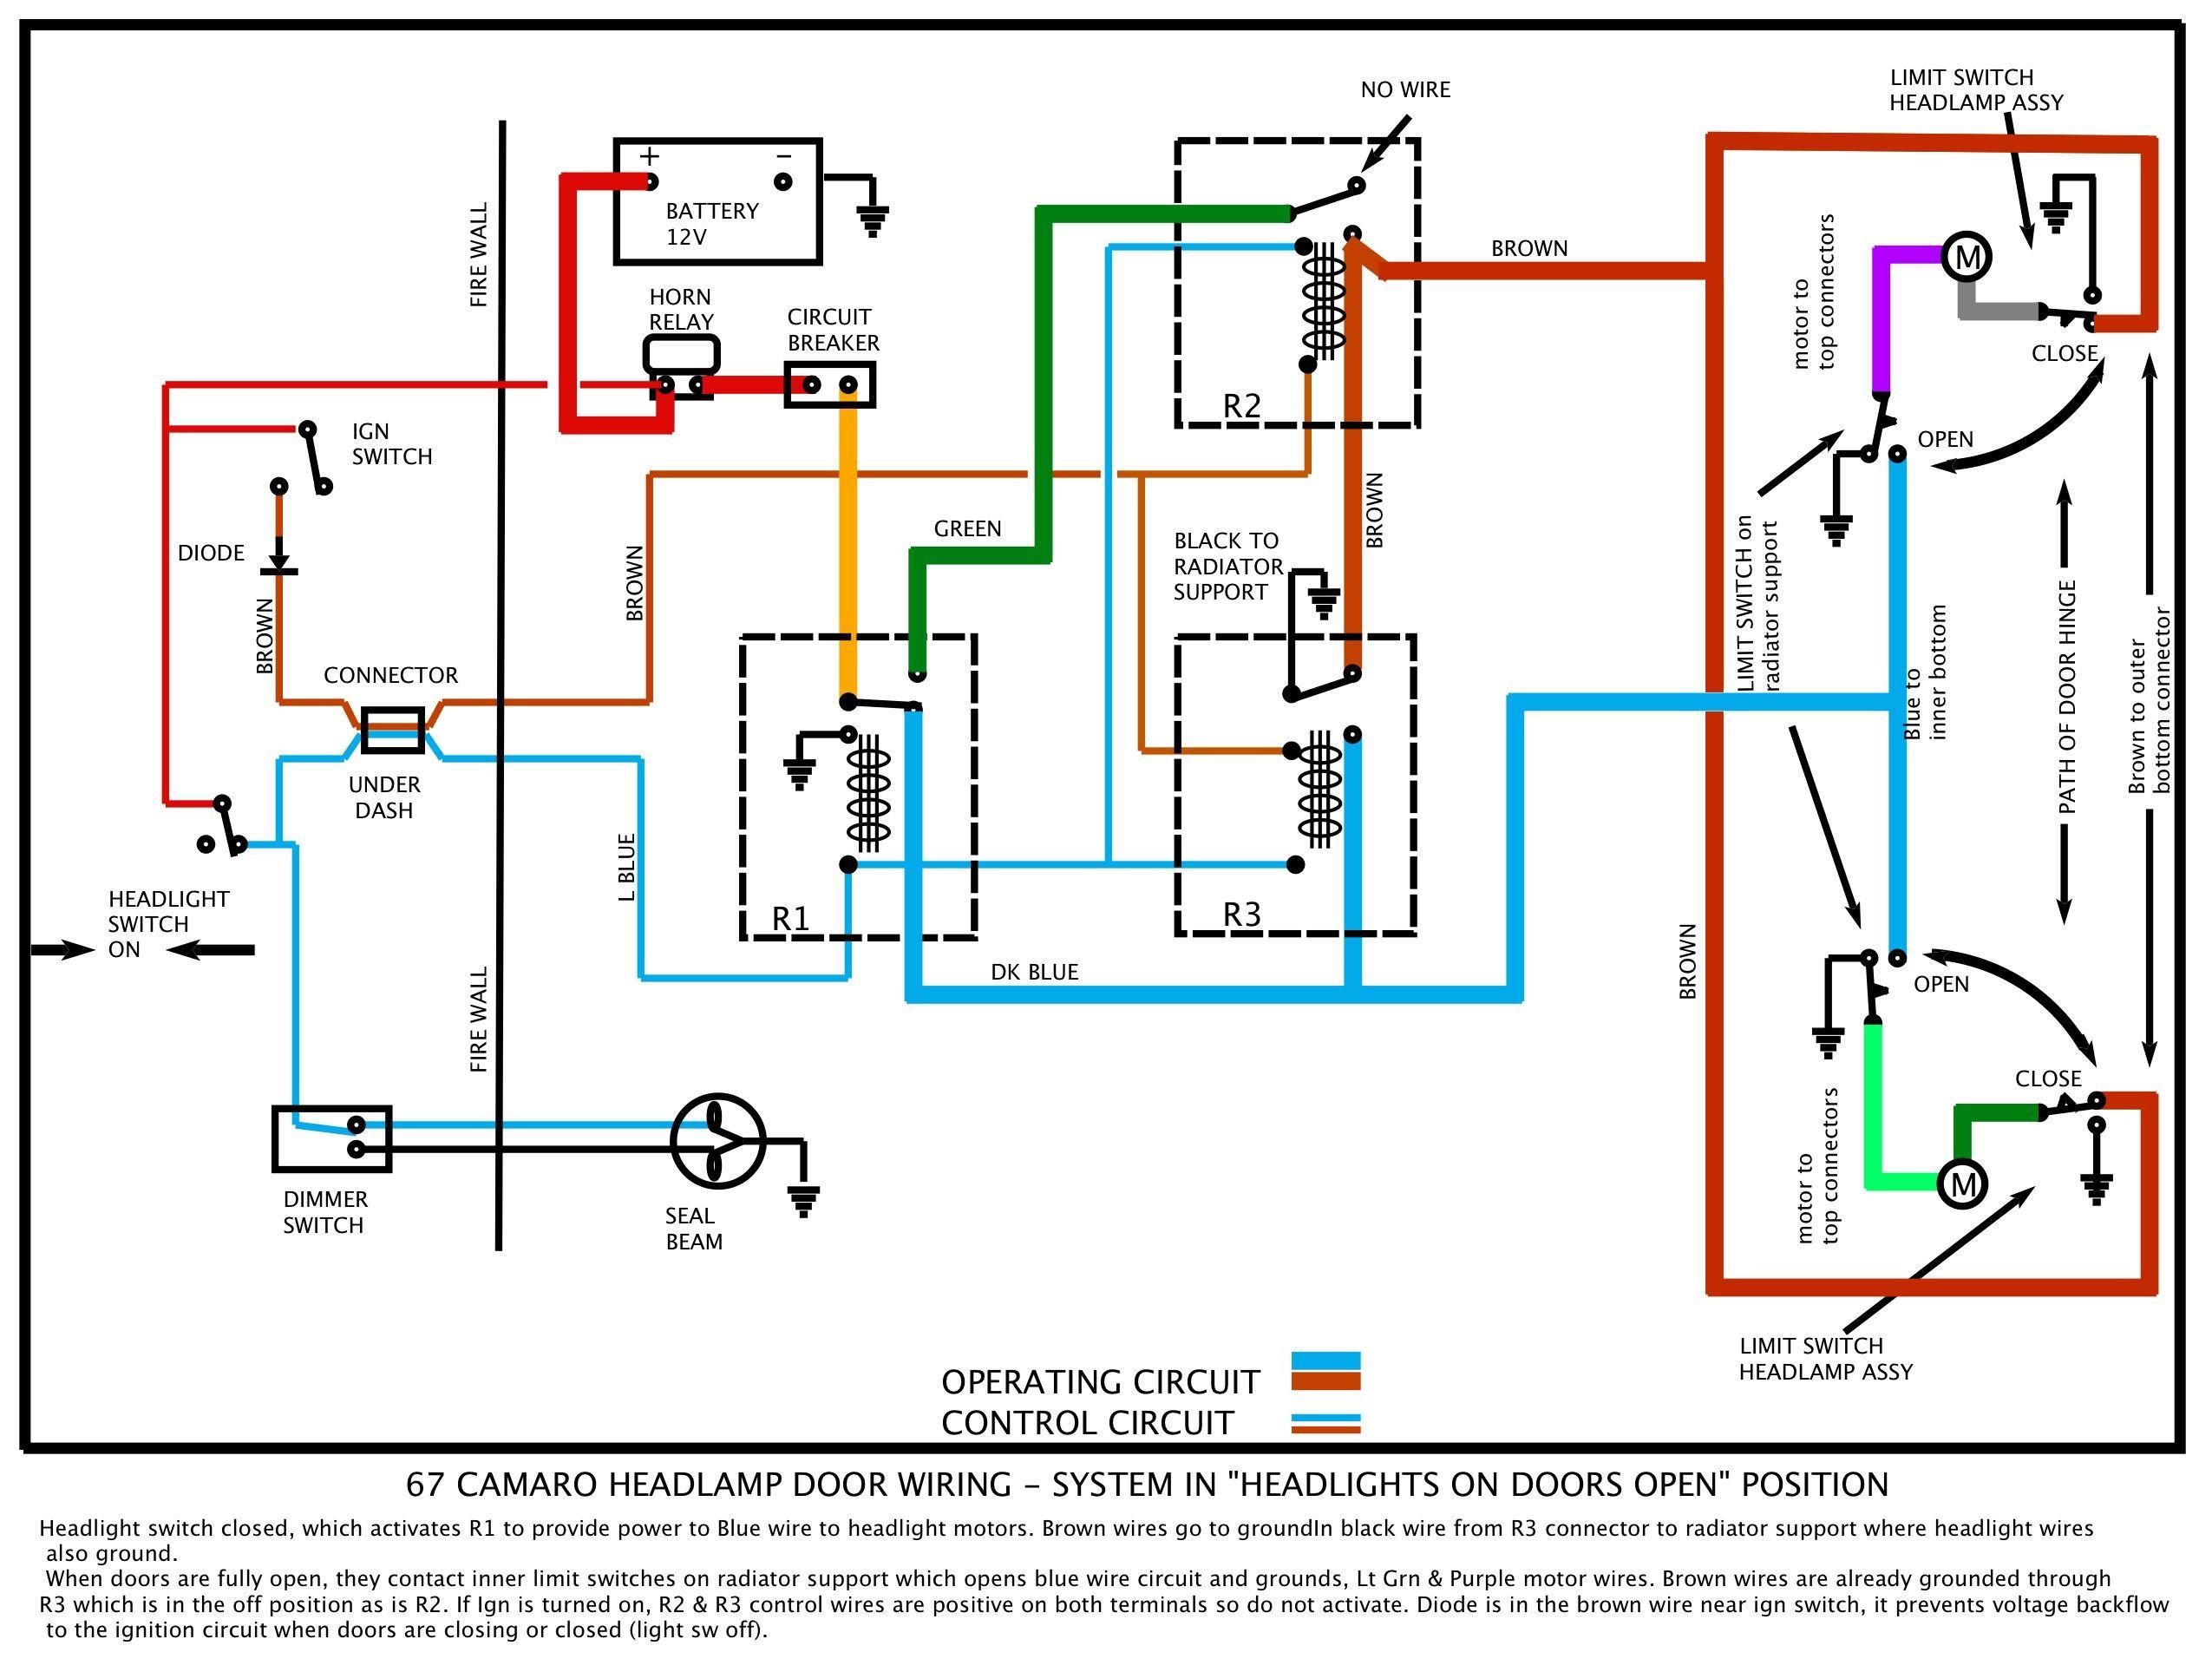 69 Camaro Wiring Diagram 95 Camaro Ignition Switch Wiring Diagram Worksheet and Wiring Of 69 Camaro Wiring Diagram